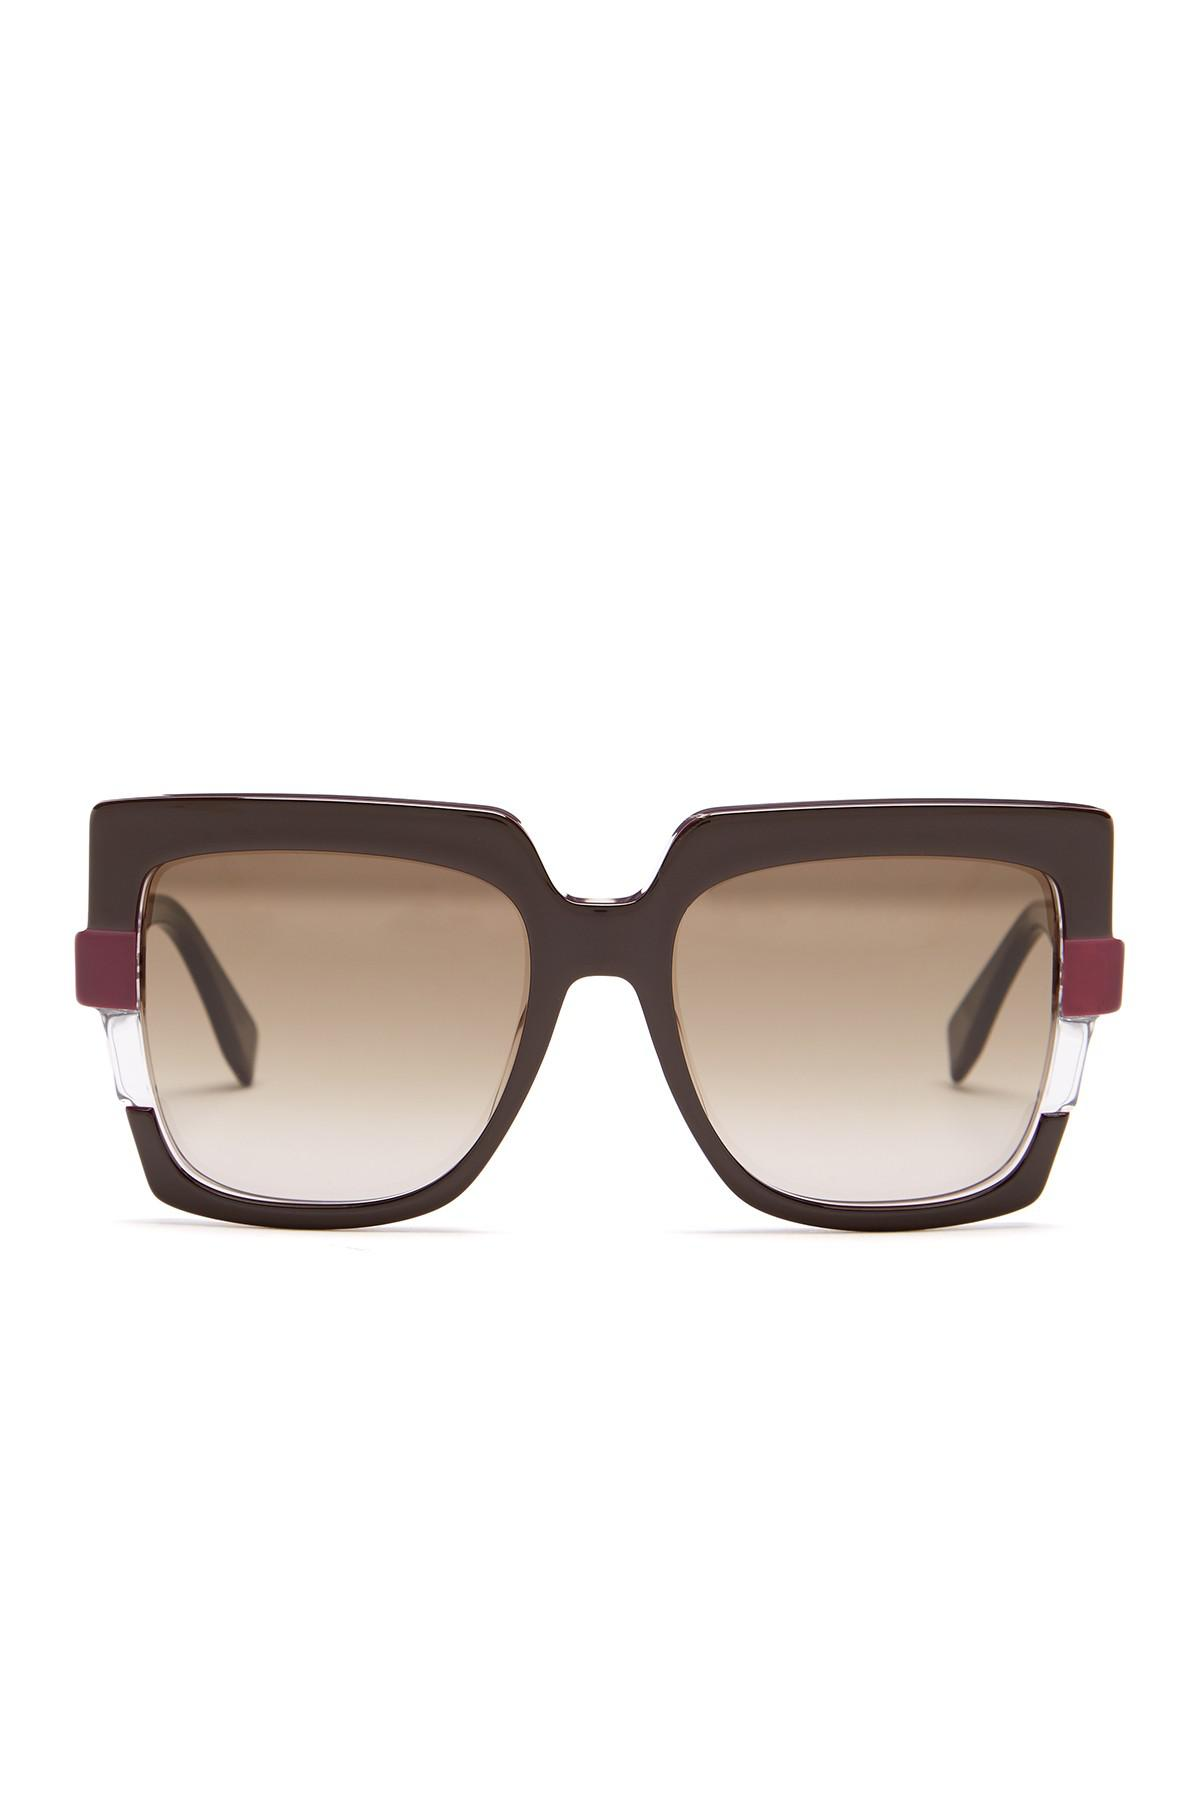 e7d1bf17a7 Lyst - Fendi Women s Metropolis 54mm Square Sunglasses